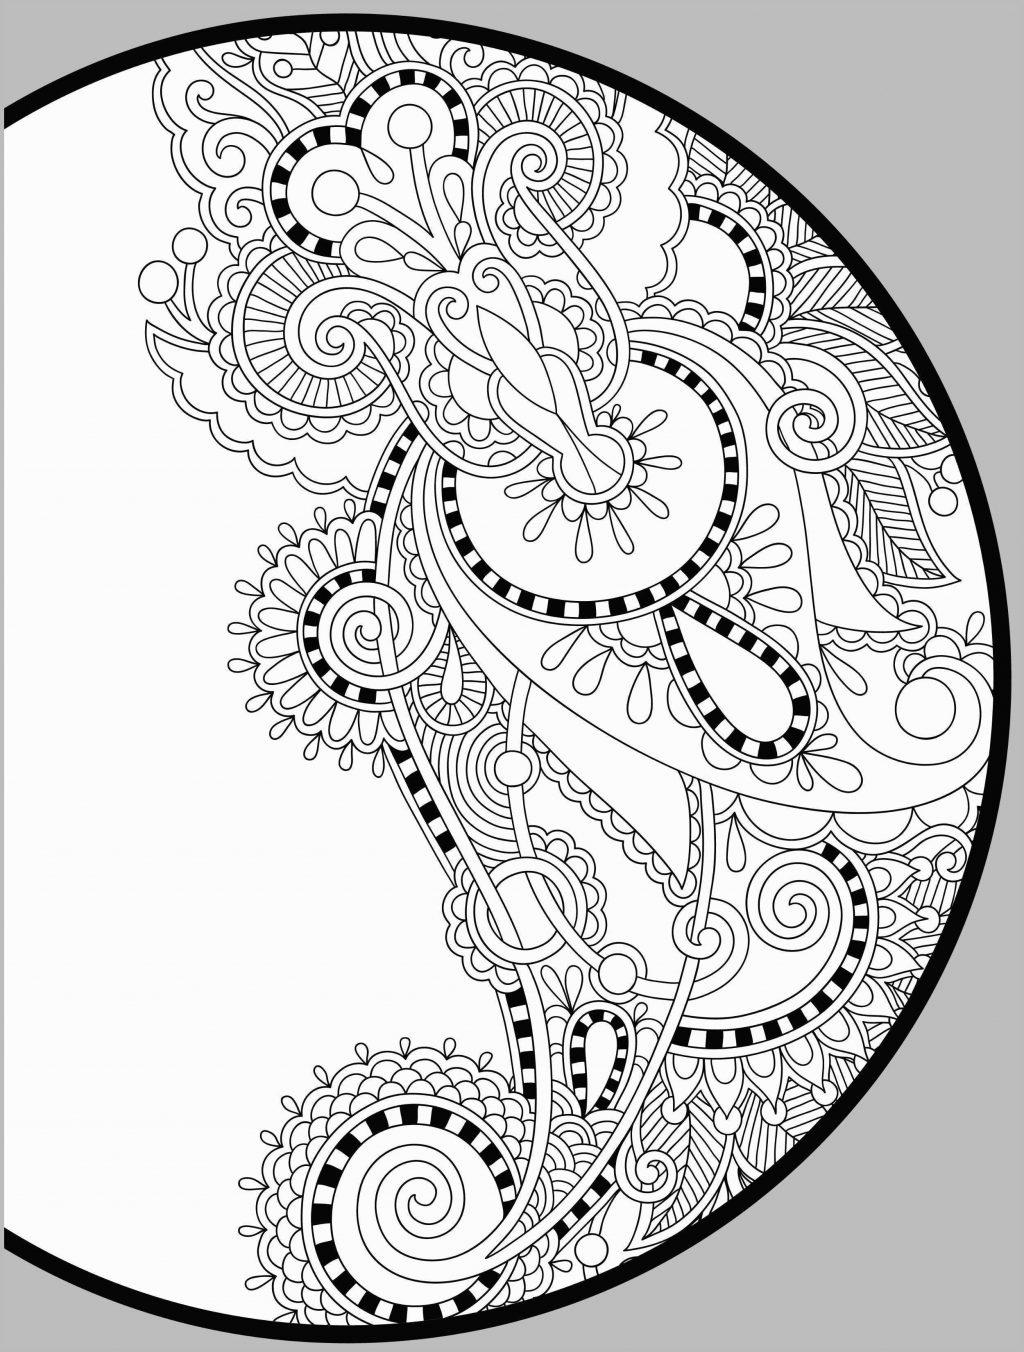 Coloring Page ~ Coloring Page Mandala Book Pdf Free Printable Pages - Free Printable Mandalas Pdf